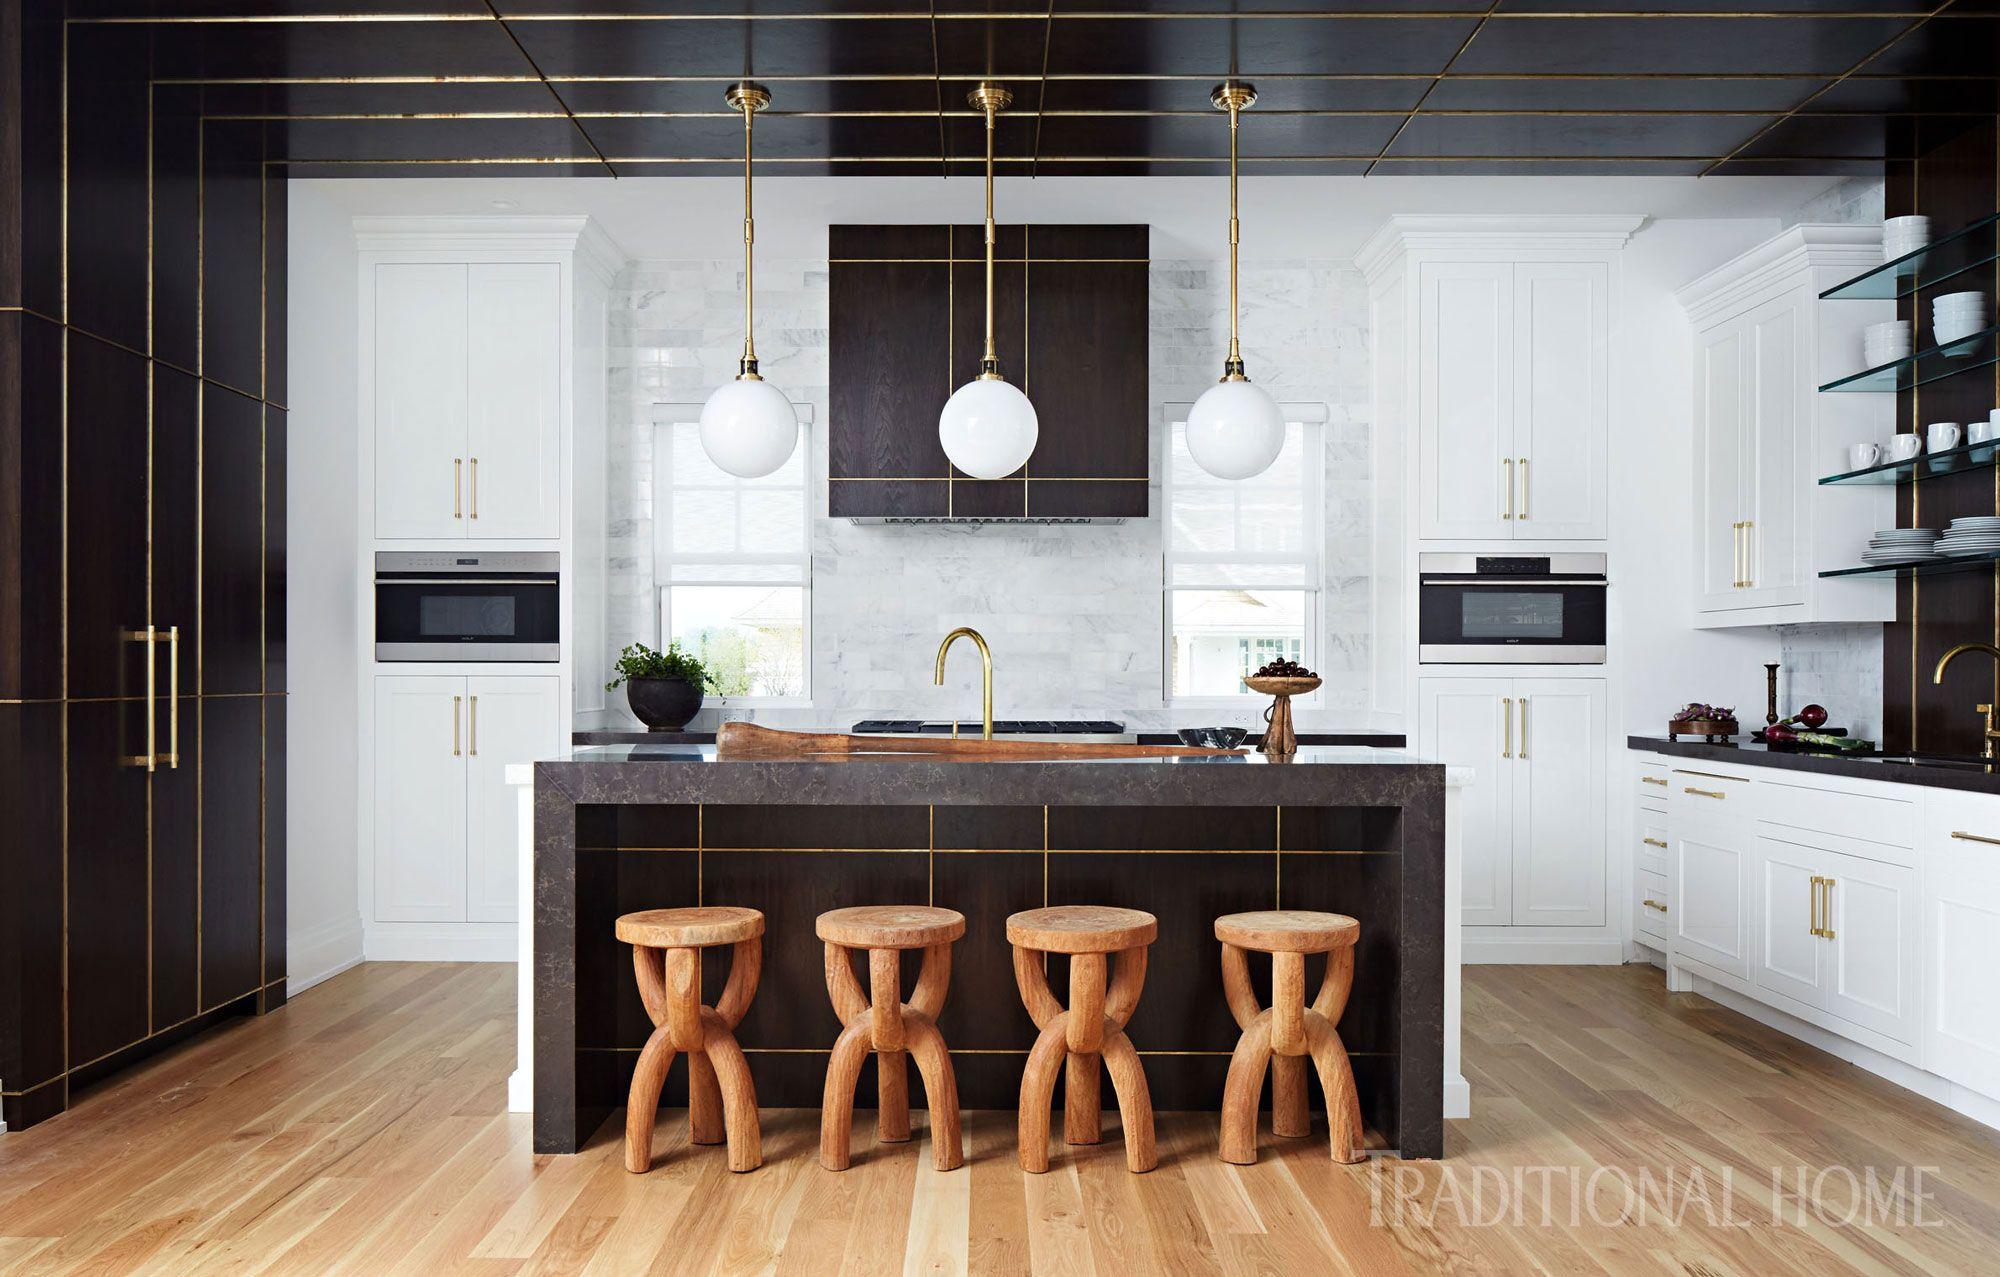 Striking Hamptons Showhouse Kitchen Traditional Home Interior Design Kitchen Kitchen Design Kitchen Interior